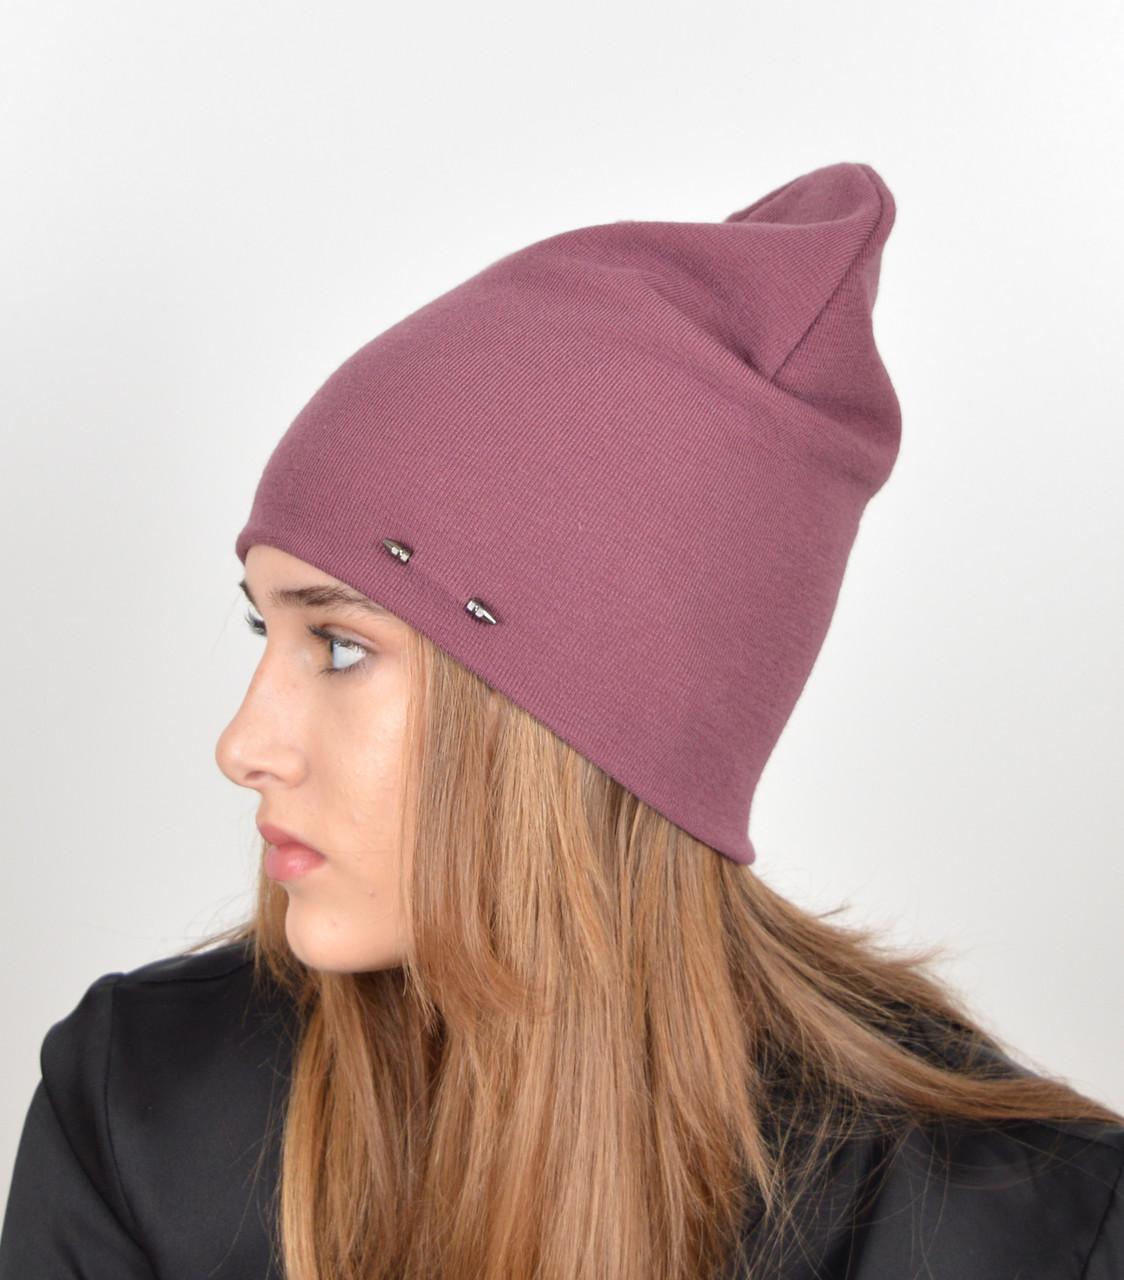 шапка пірсинг хмельницький